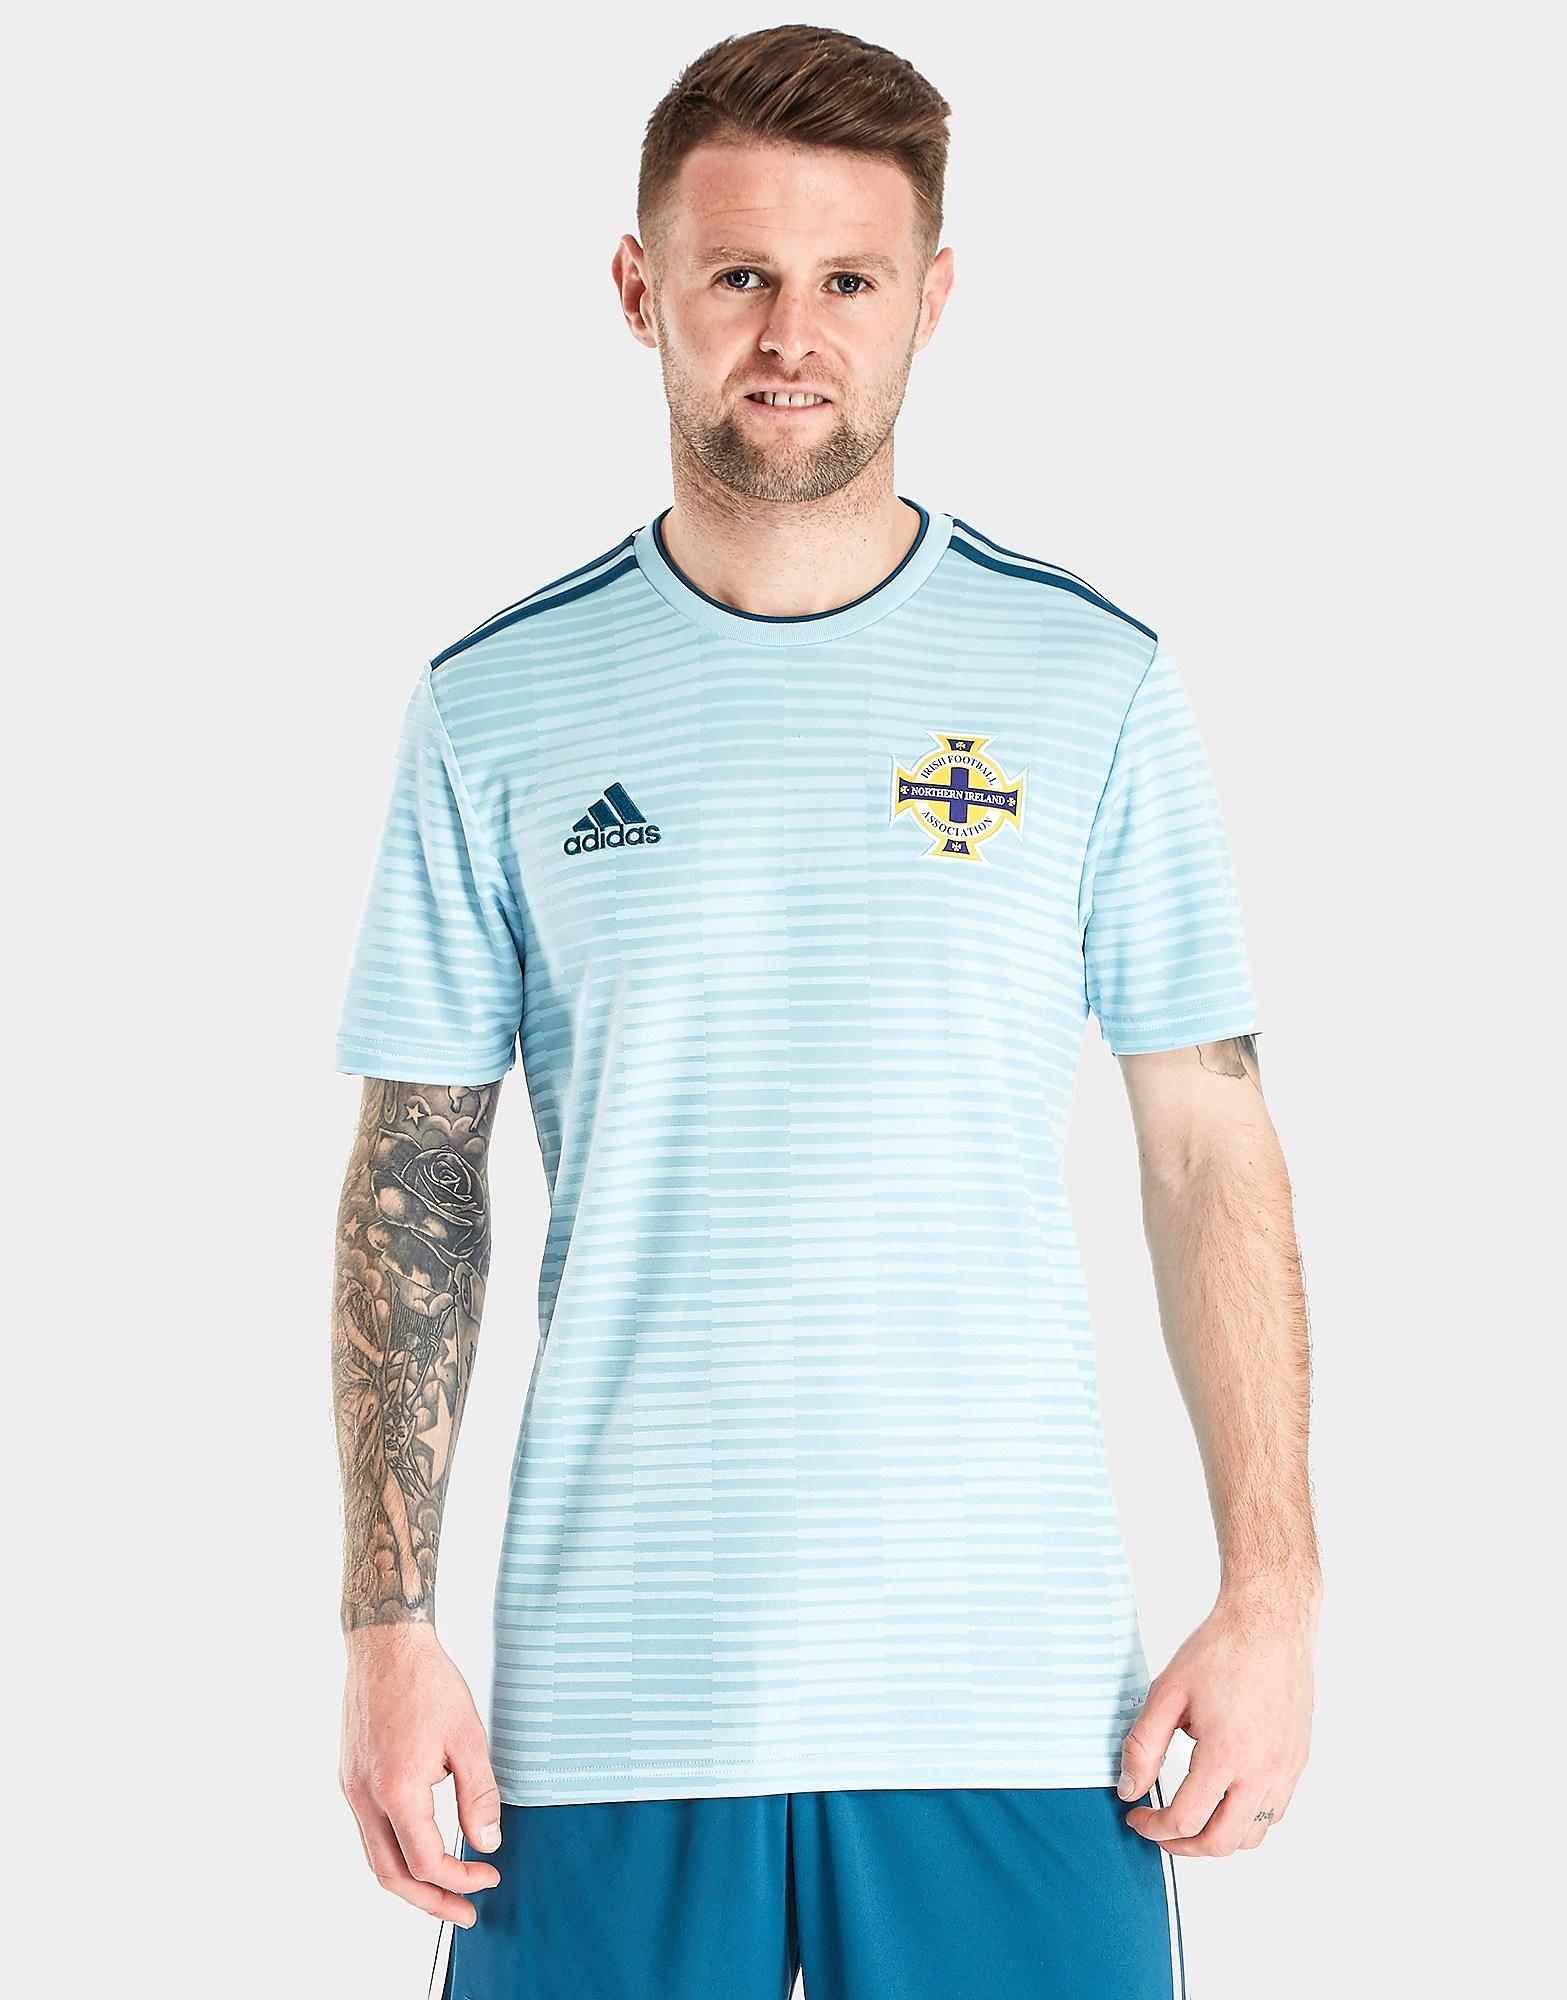 adidas Northern Ireland 2018 Away Shirt